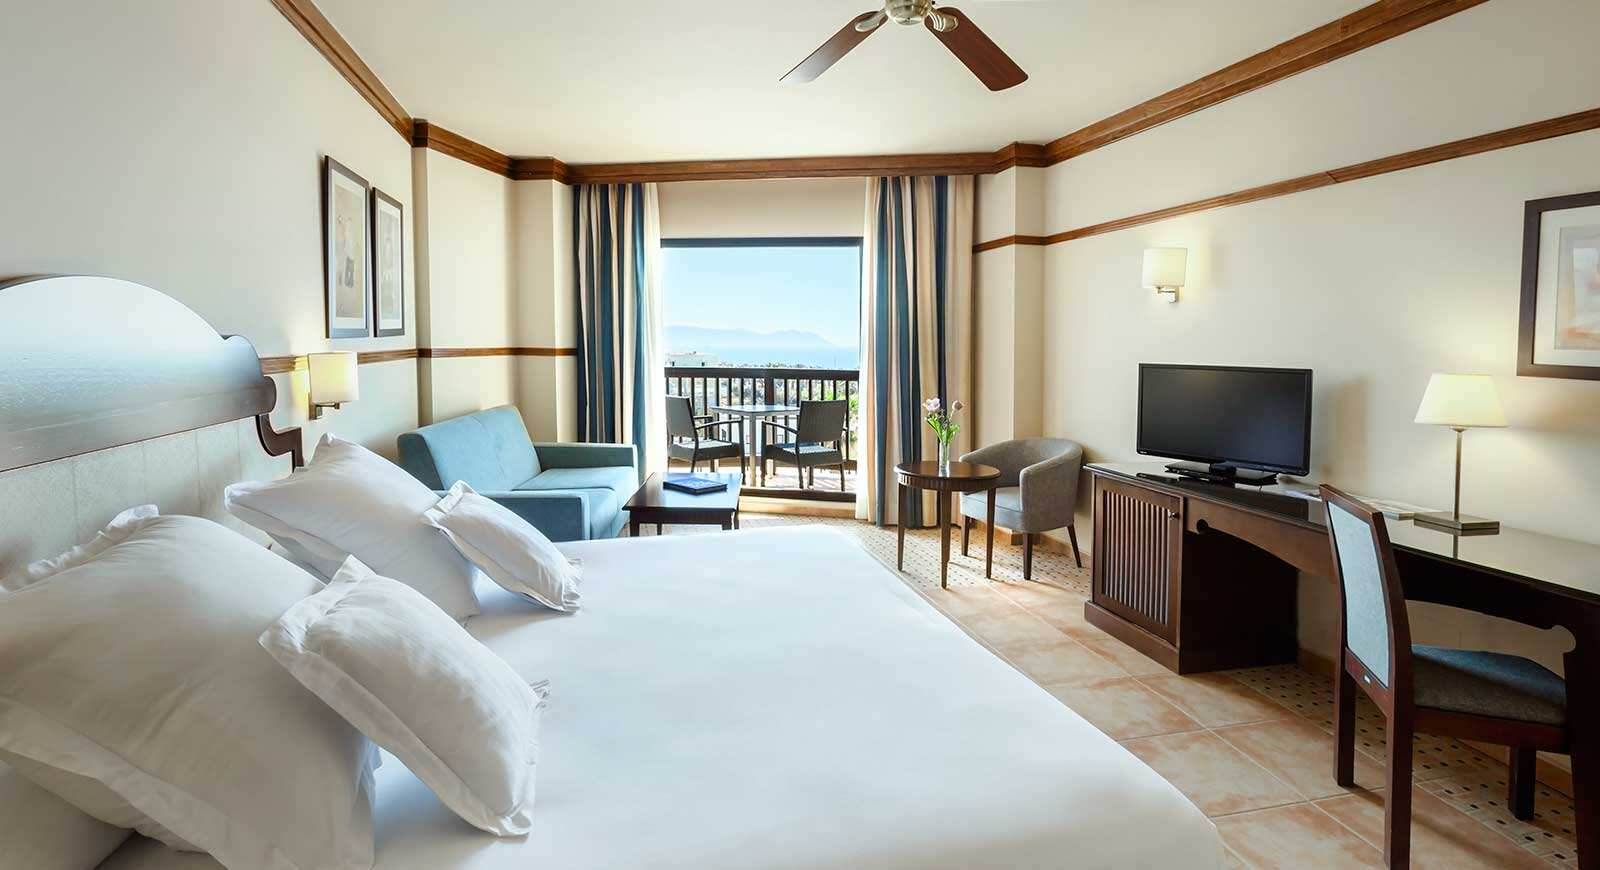 236-room-34-hotel-barcelo-cabo-de-gata_tcm20-8575_w1600_h870_n.jpg